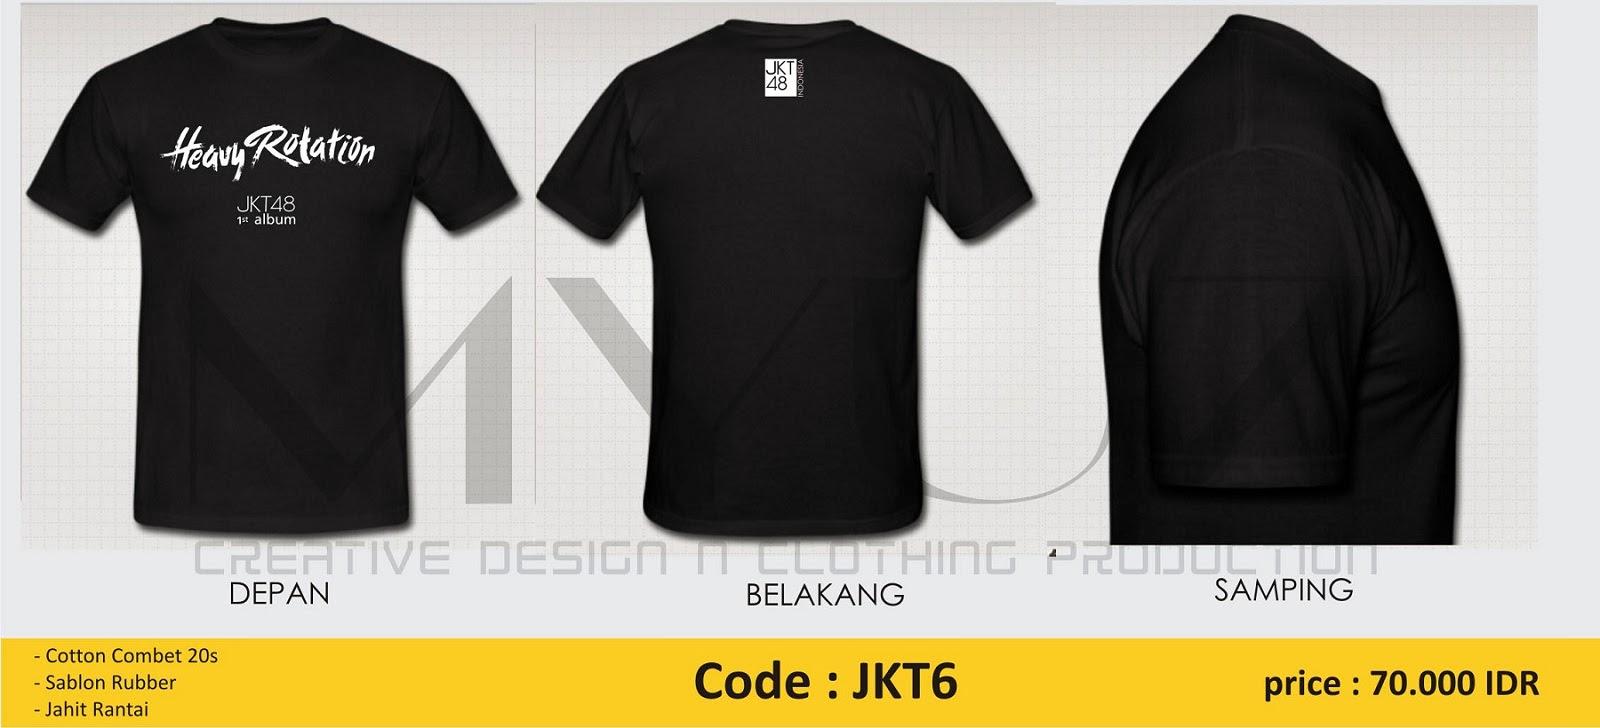 Desain t shirt jkt48 - Desain T Shirt Jkt48 Kaos Jkt48